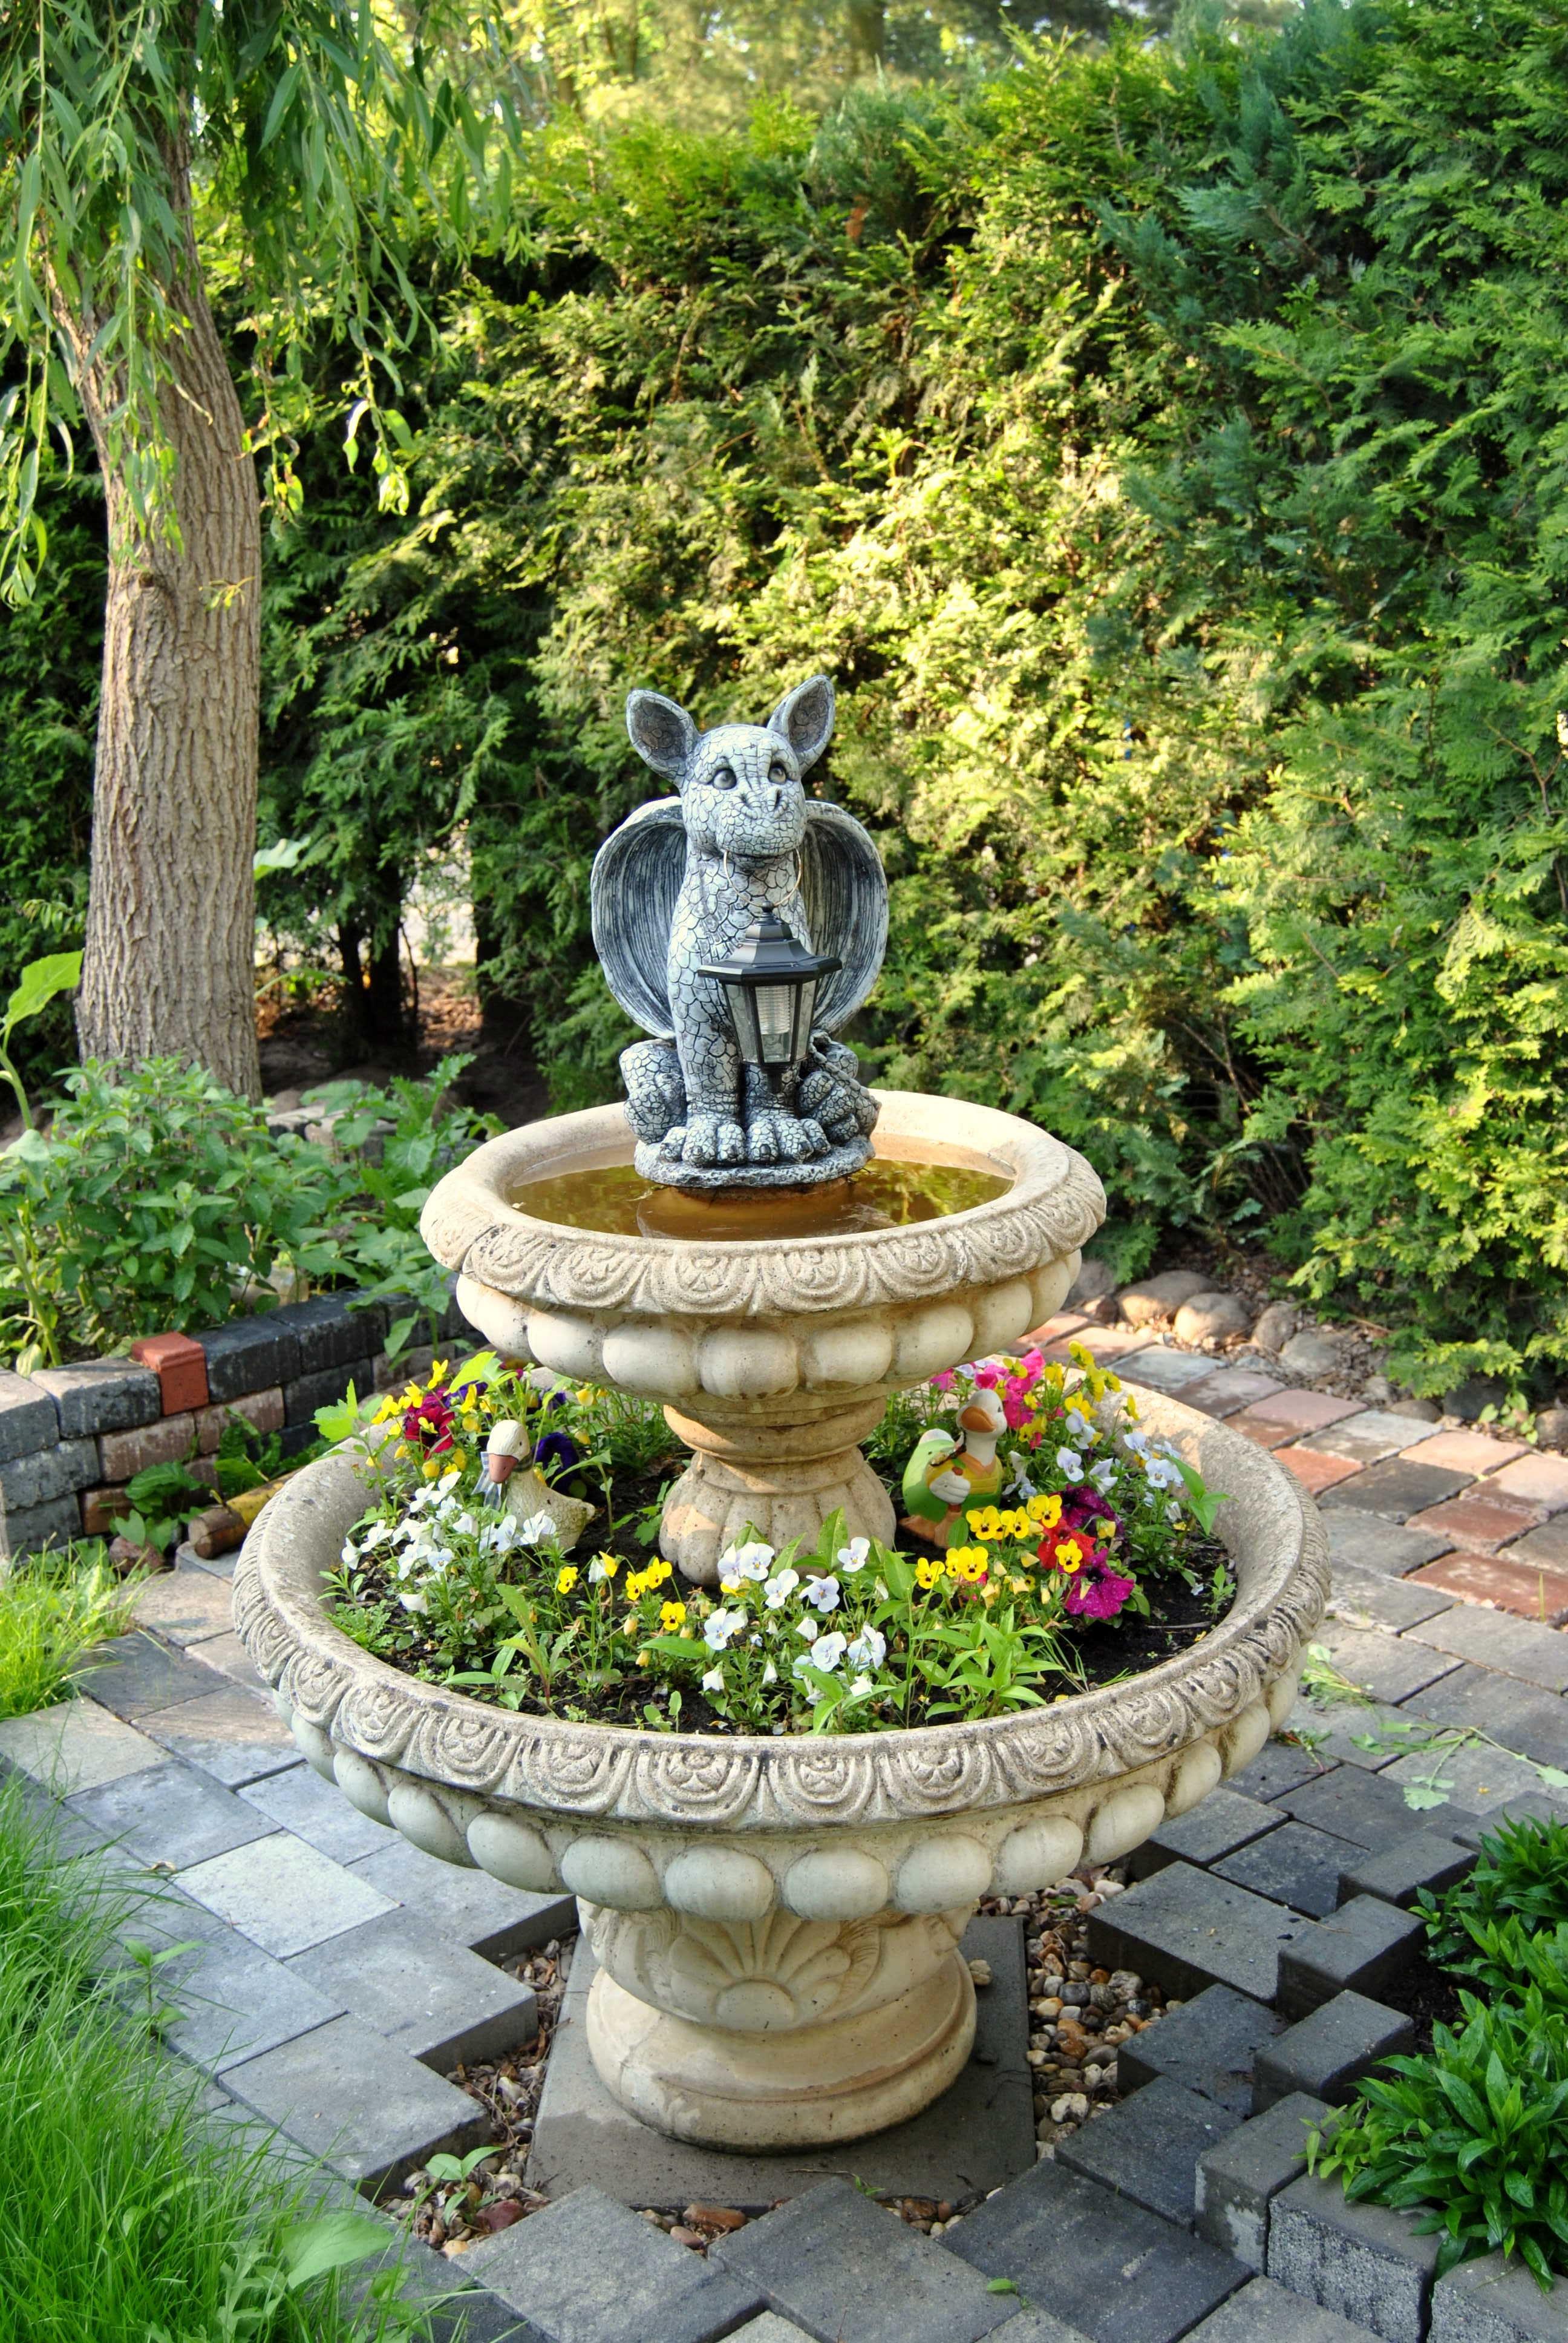 Beautiful Flower Backyard Botany Garden Deco Sculpture Fountain Yard Water Feature